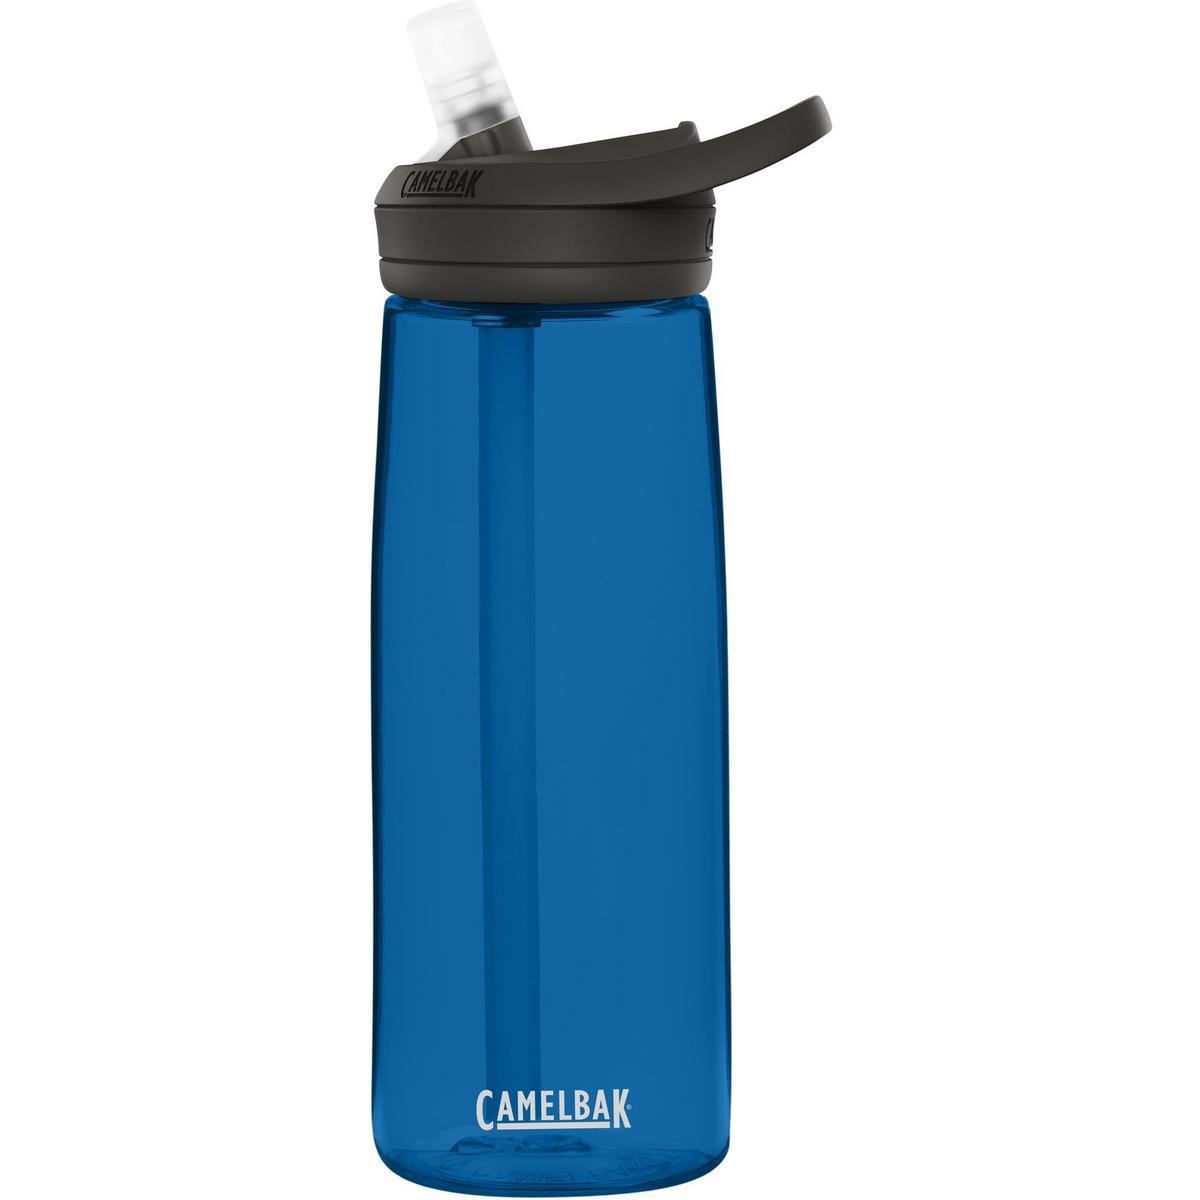 Camelbak Bottle Eddy+ 0.75L - Blue